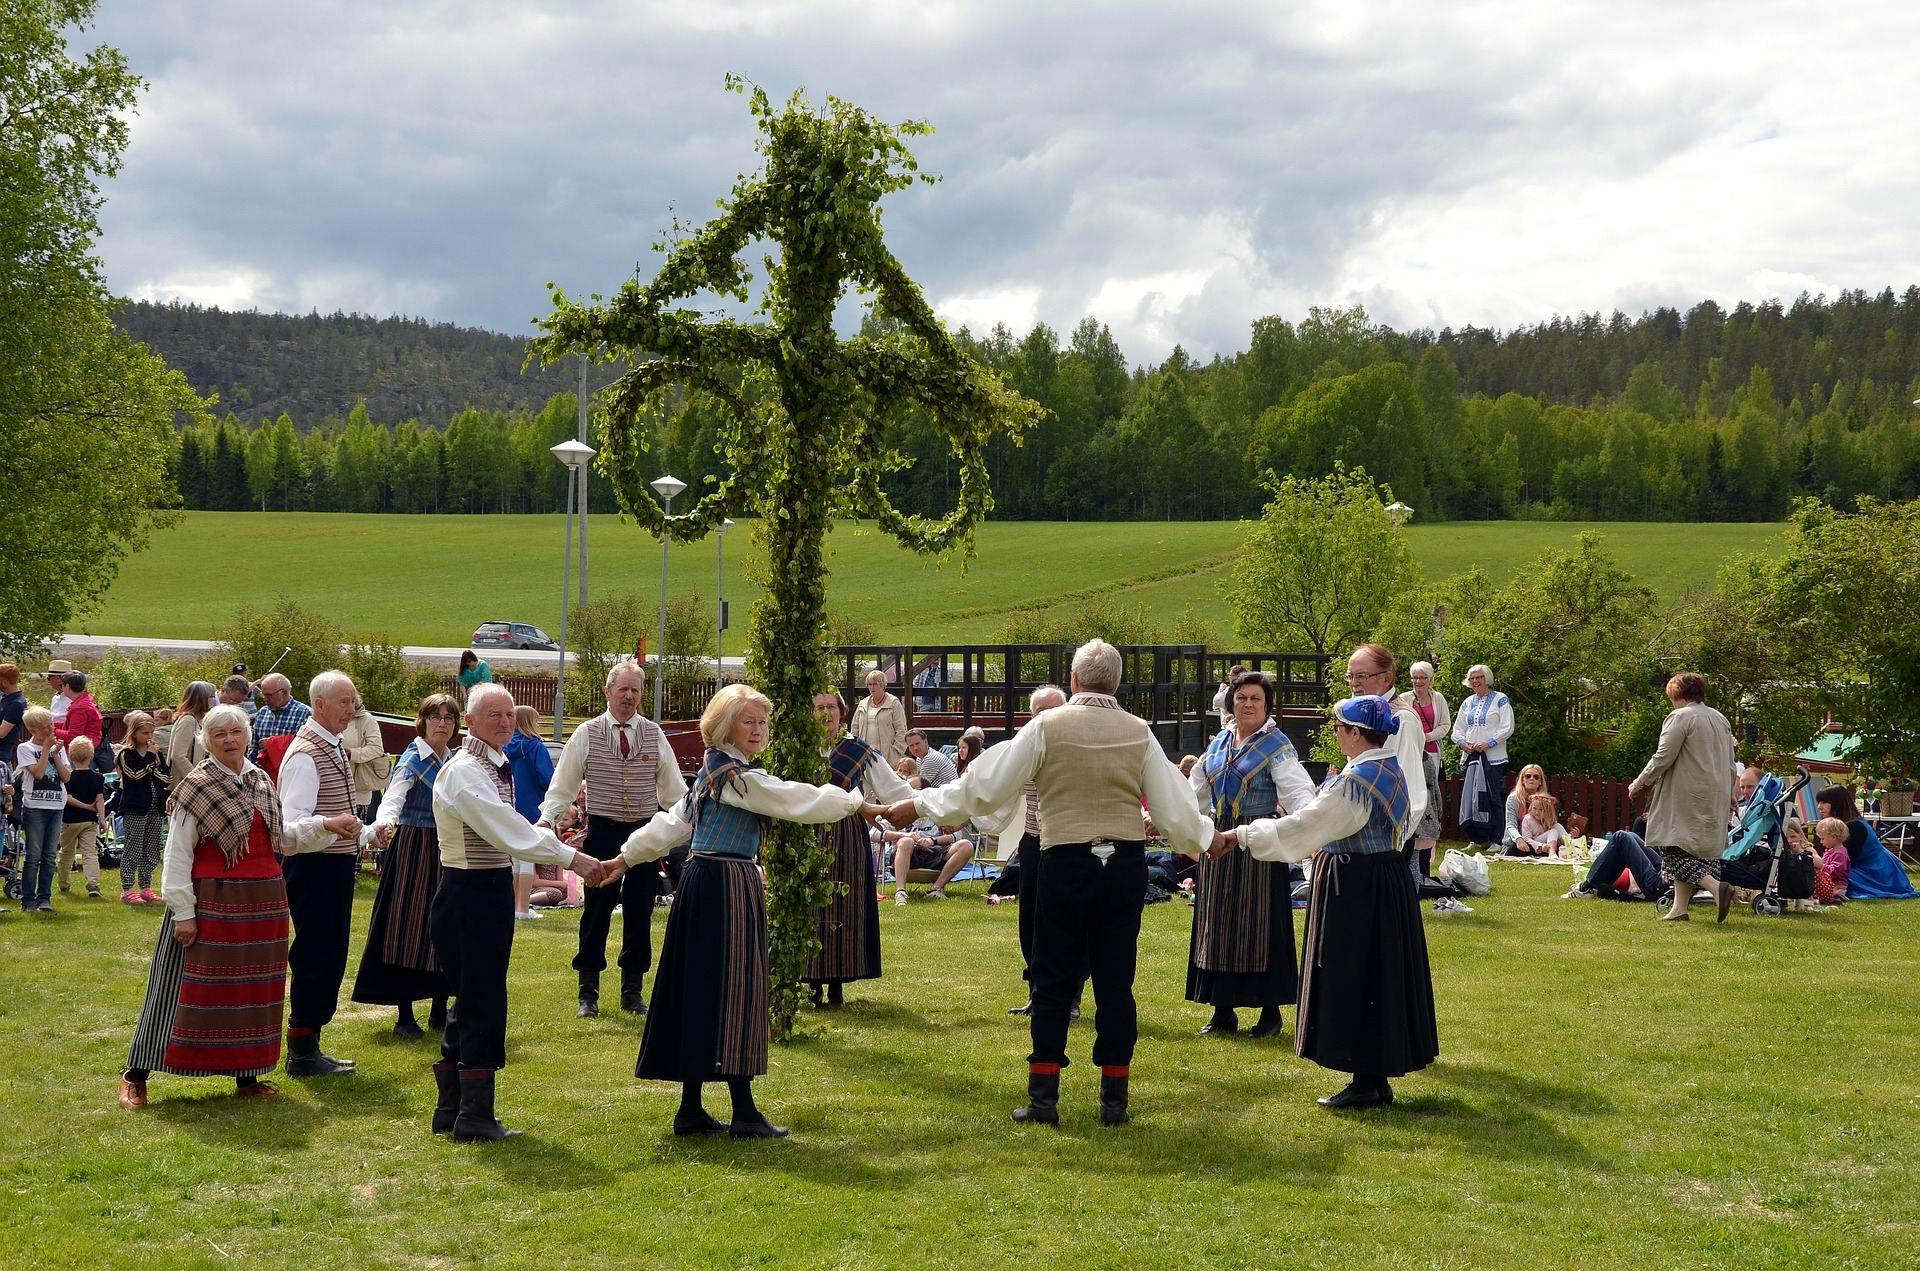 MAYPOLE DANCE -- Corina Selberg - PX